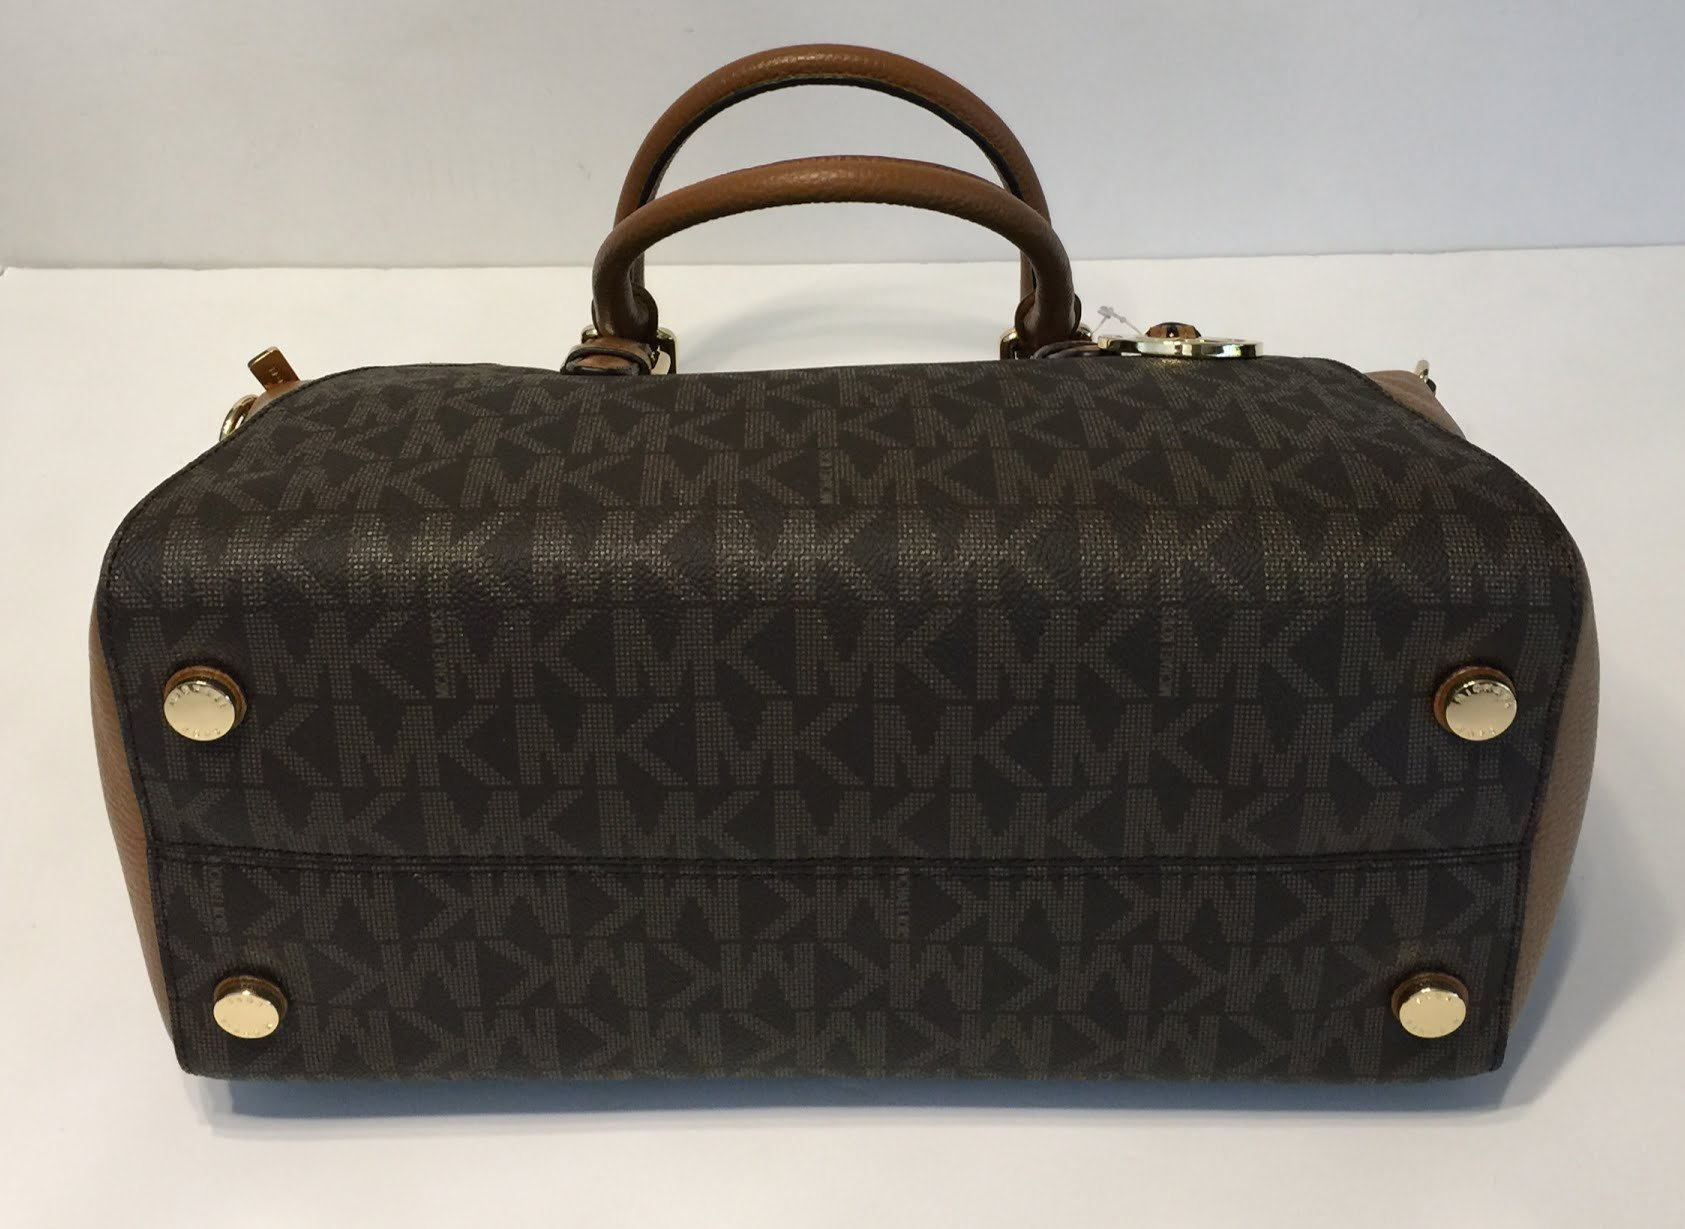 MICHAEL Michael Kors Ciara Large TZ Satchel bundled with Michael Kors Jet Set Travel Continental Wallet Wristlet (Signature MK Brown/Acorn) by Michael Kors (Image #5)